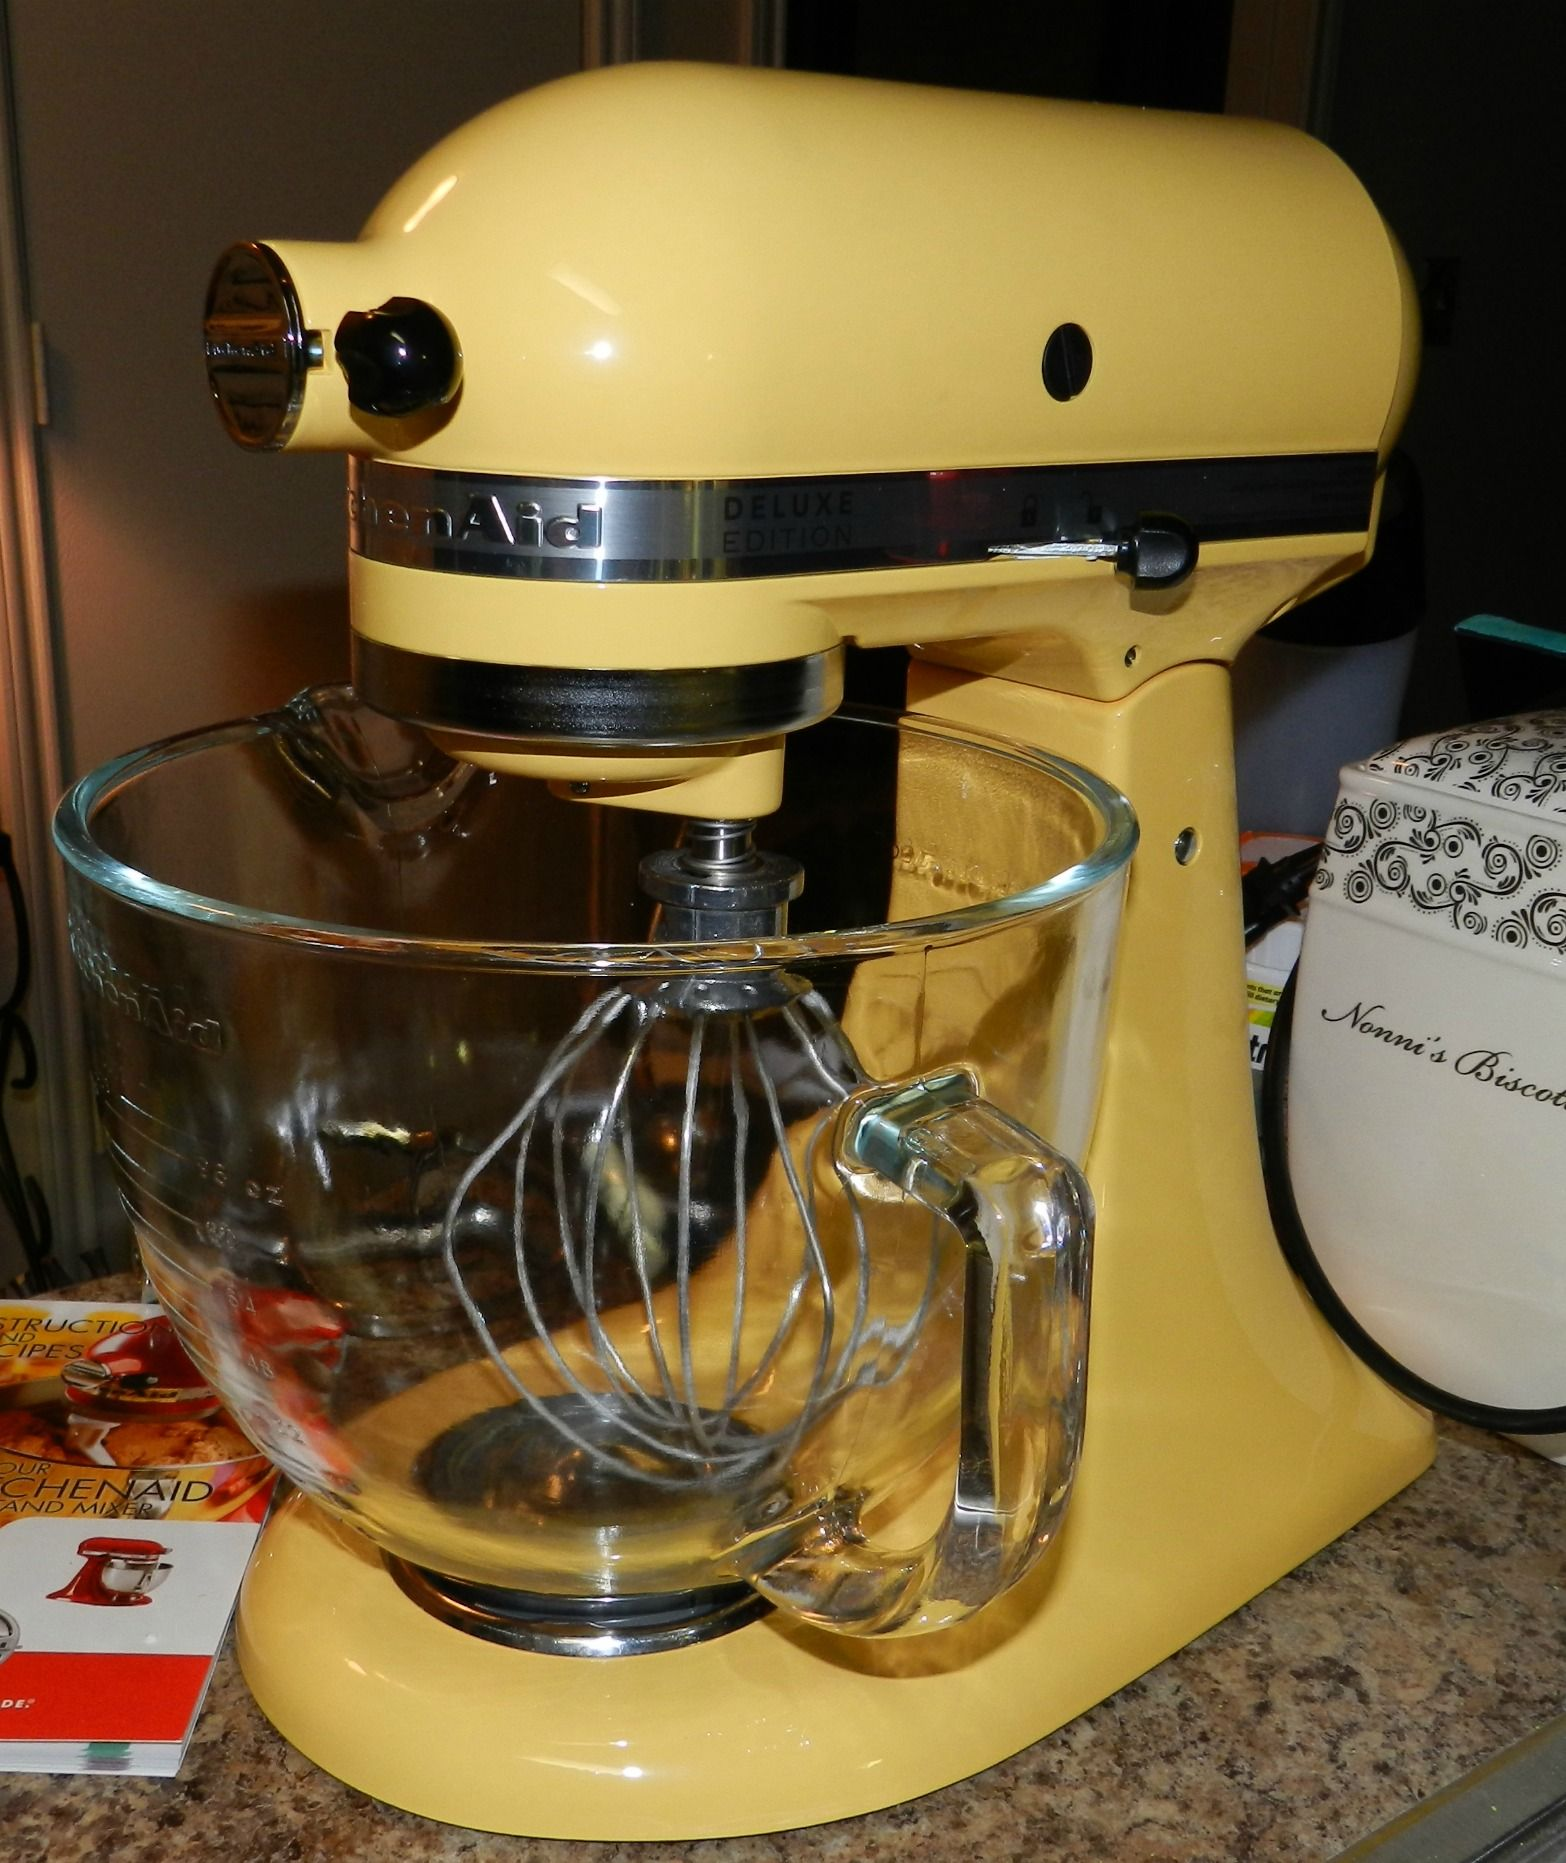 International home housewares show 2013 kitchenaid custom - Kitchenaid Mixer In Buttercup